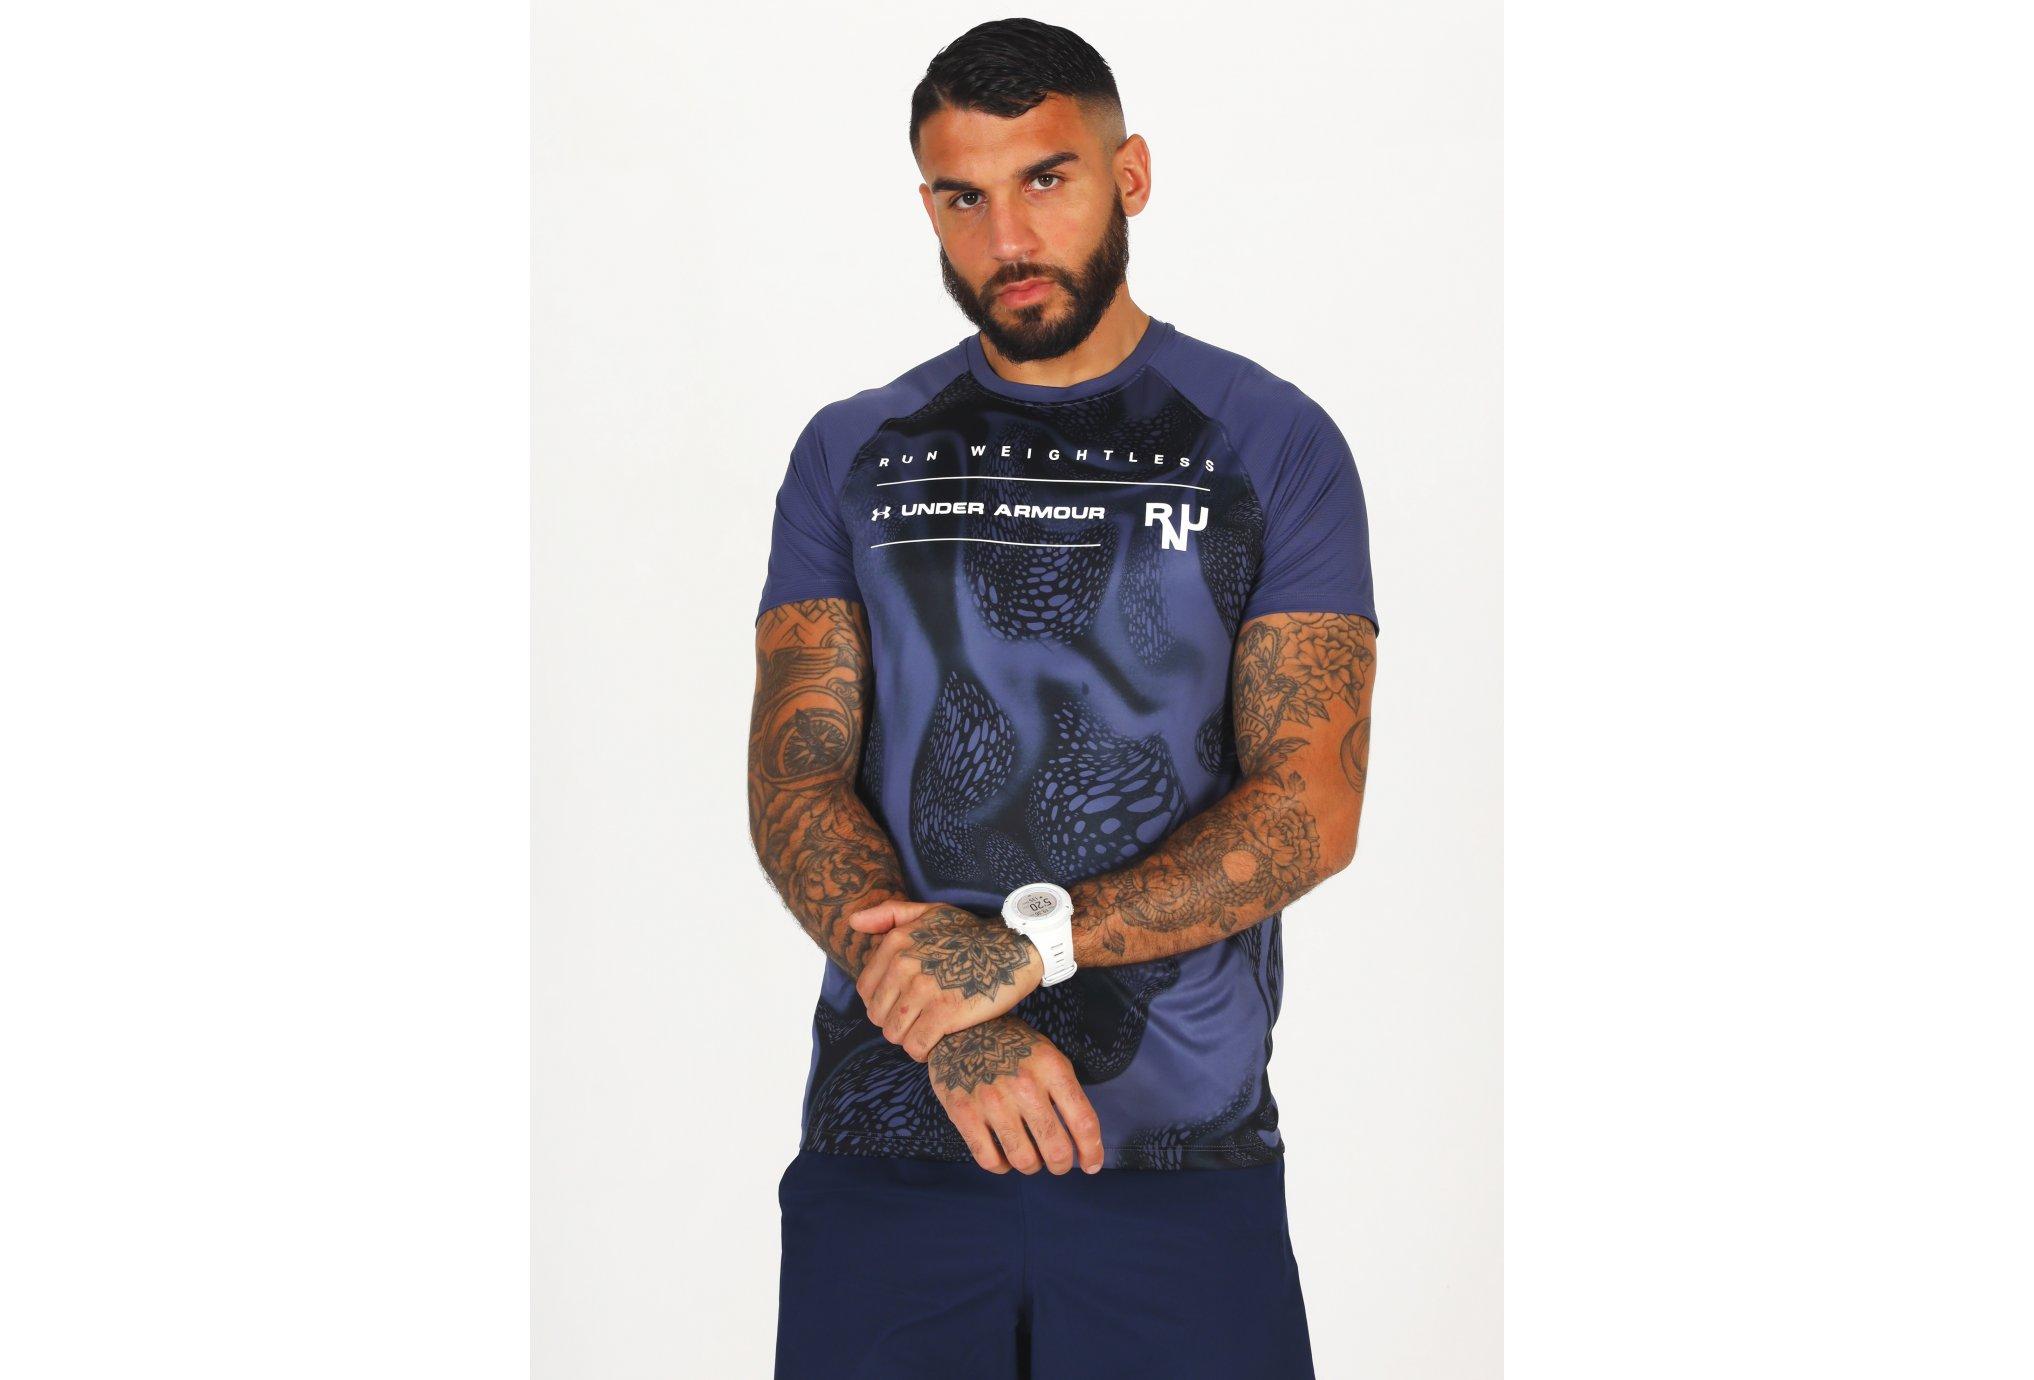 Under Armour Qualifier Iso-Chill Run Weightless M Diététique Vêtements homme